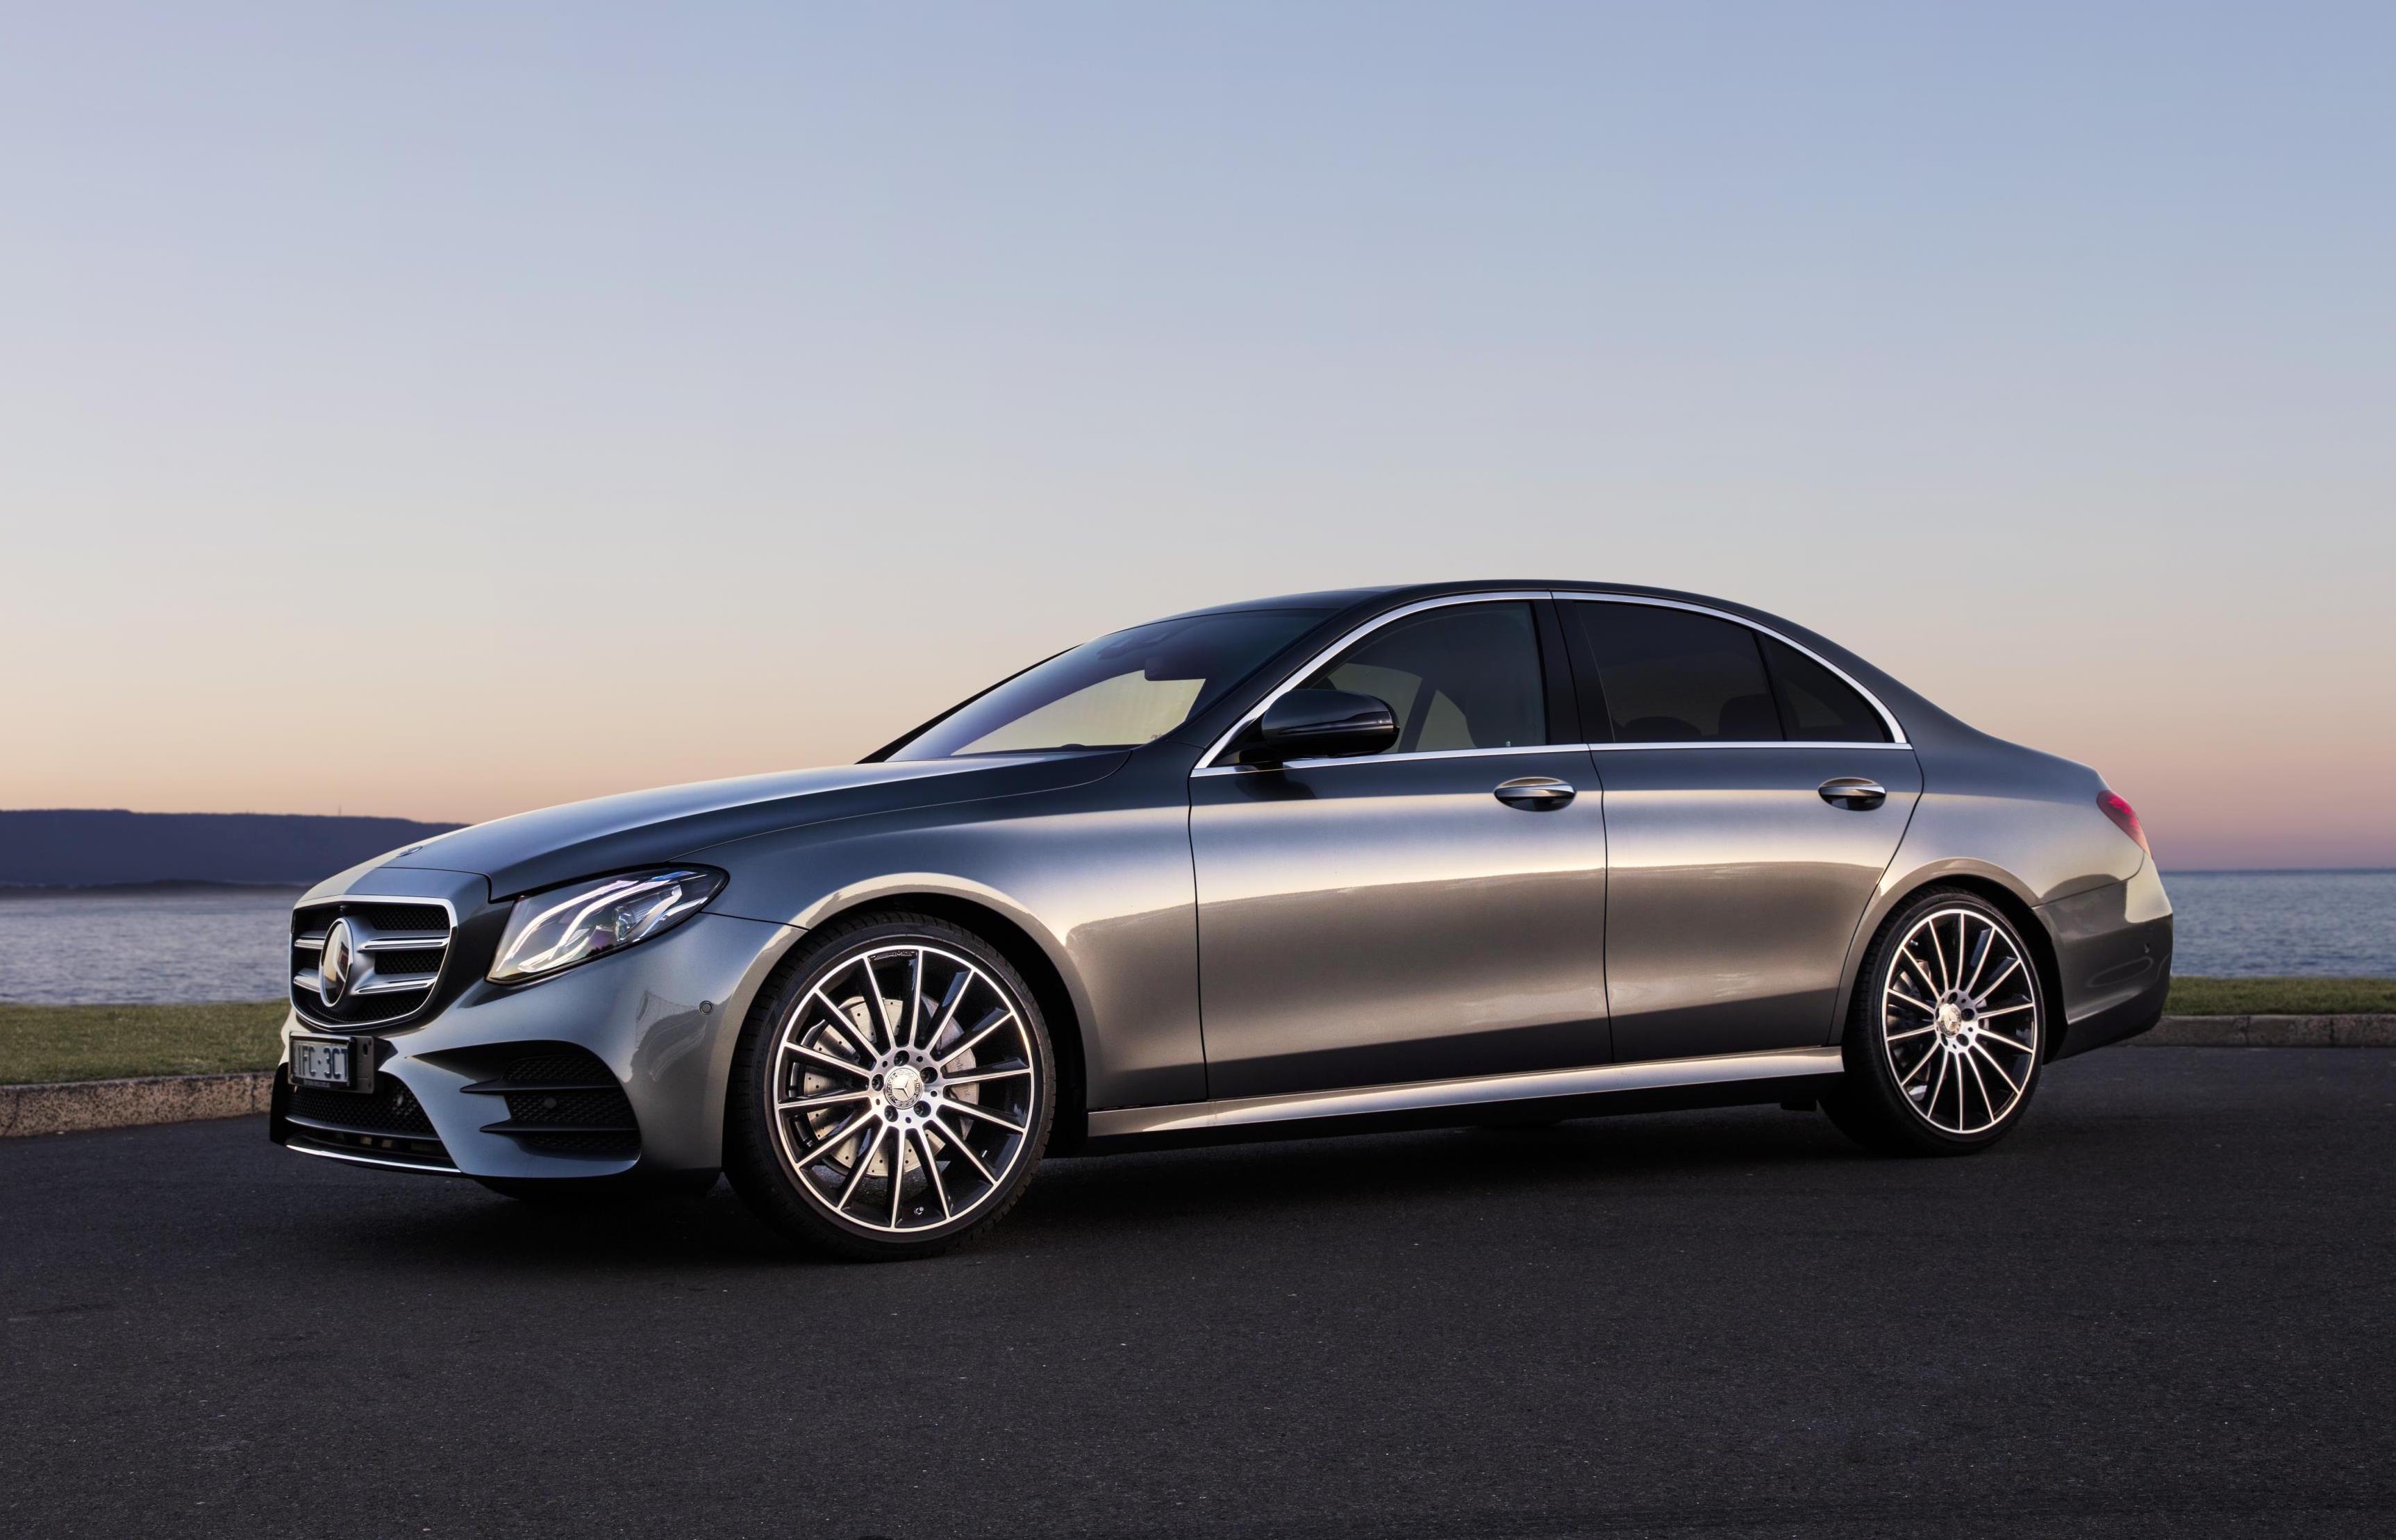 2019 Mercedes-Benz E-Class announced in Australia, E 53 AMG